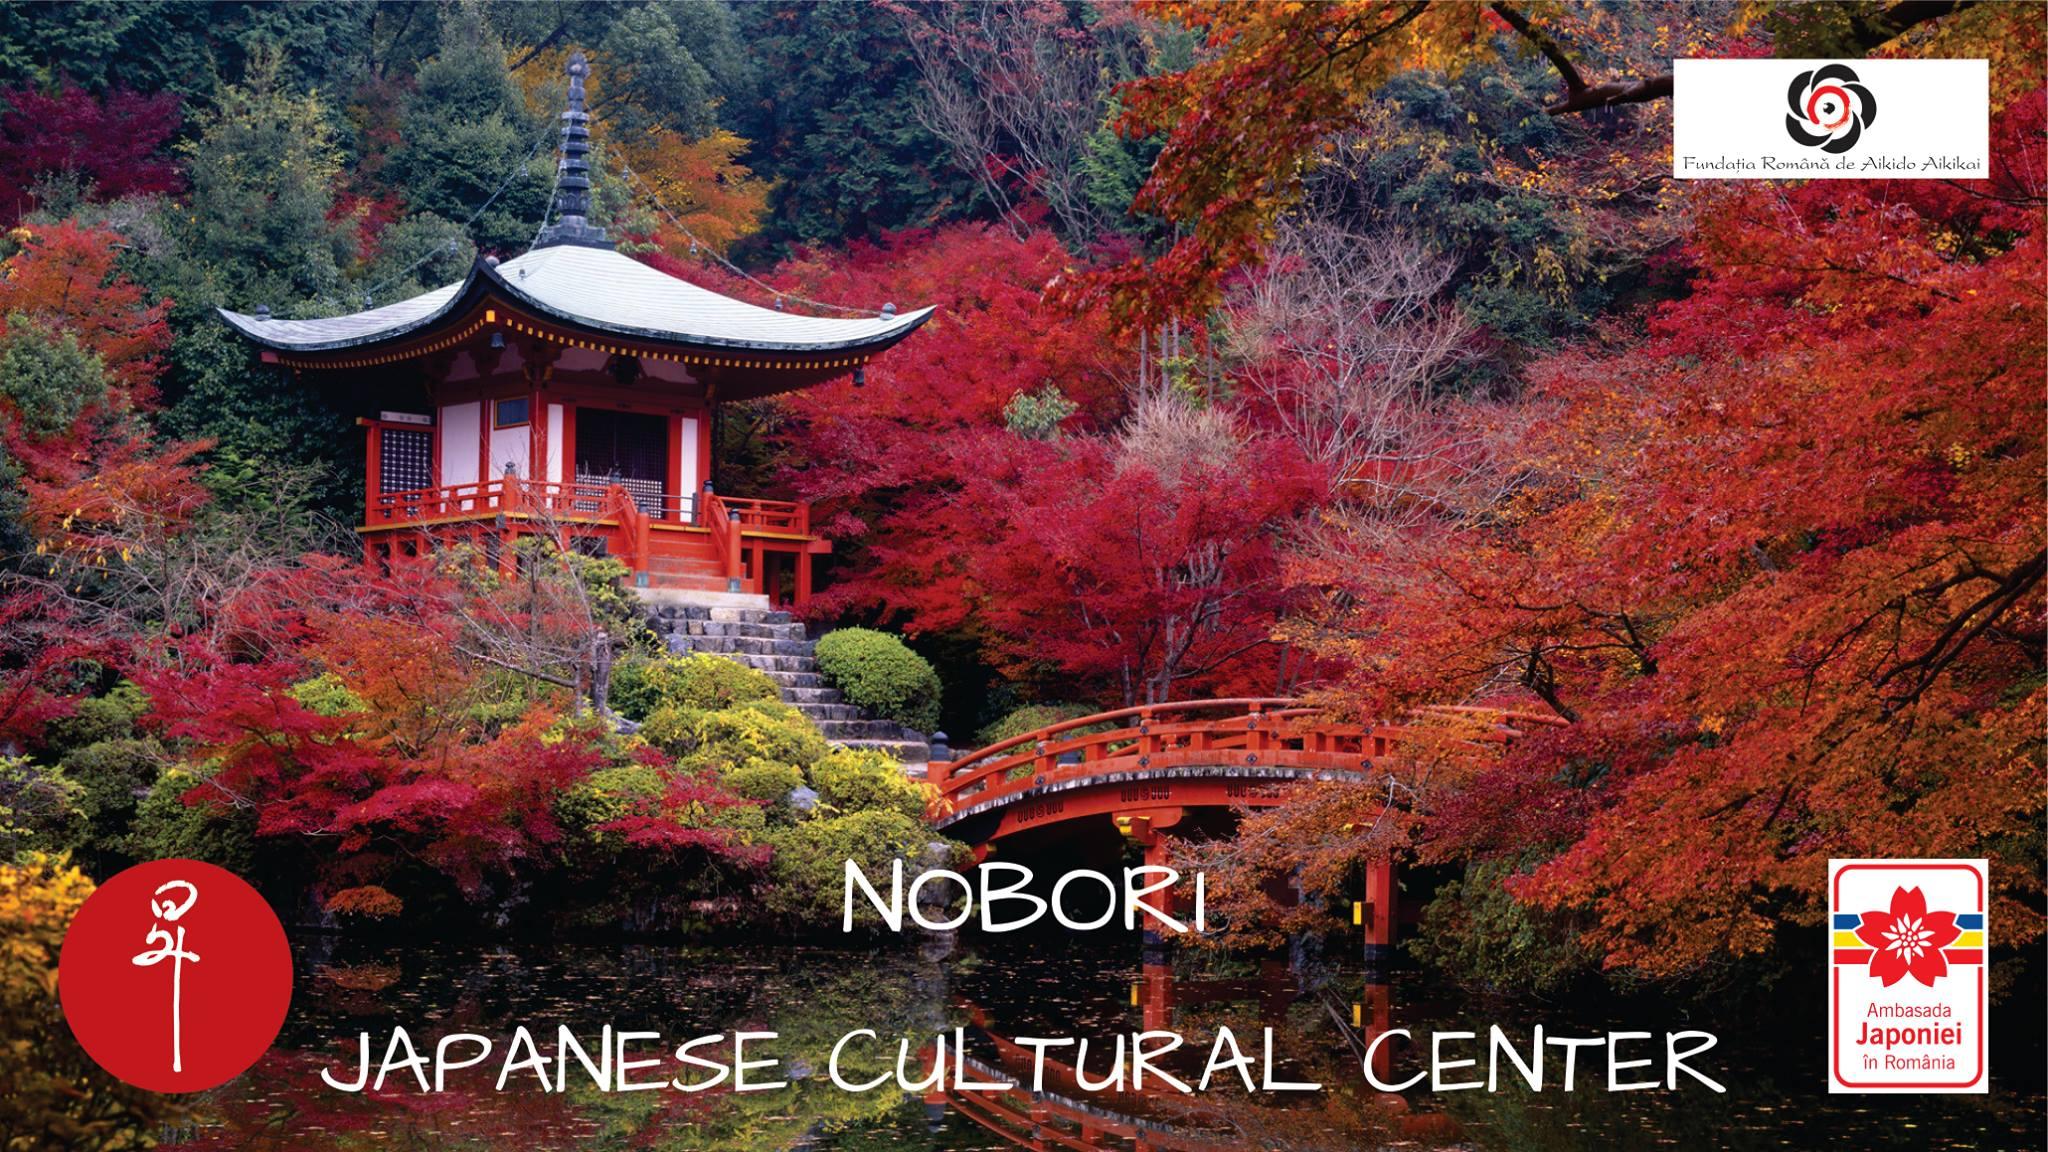 Luna Culturii Japoneze